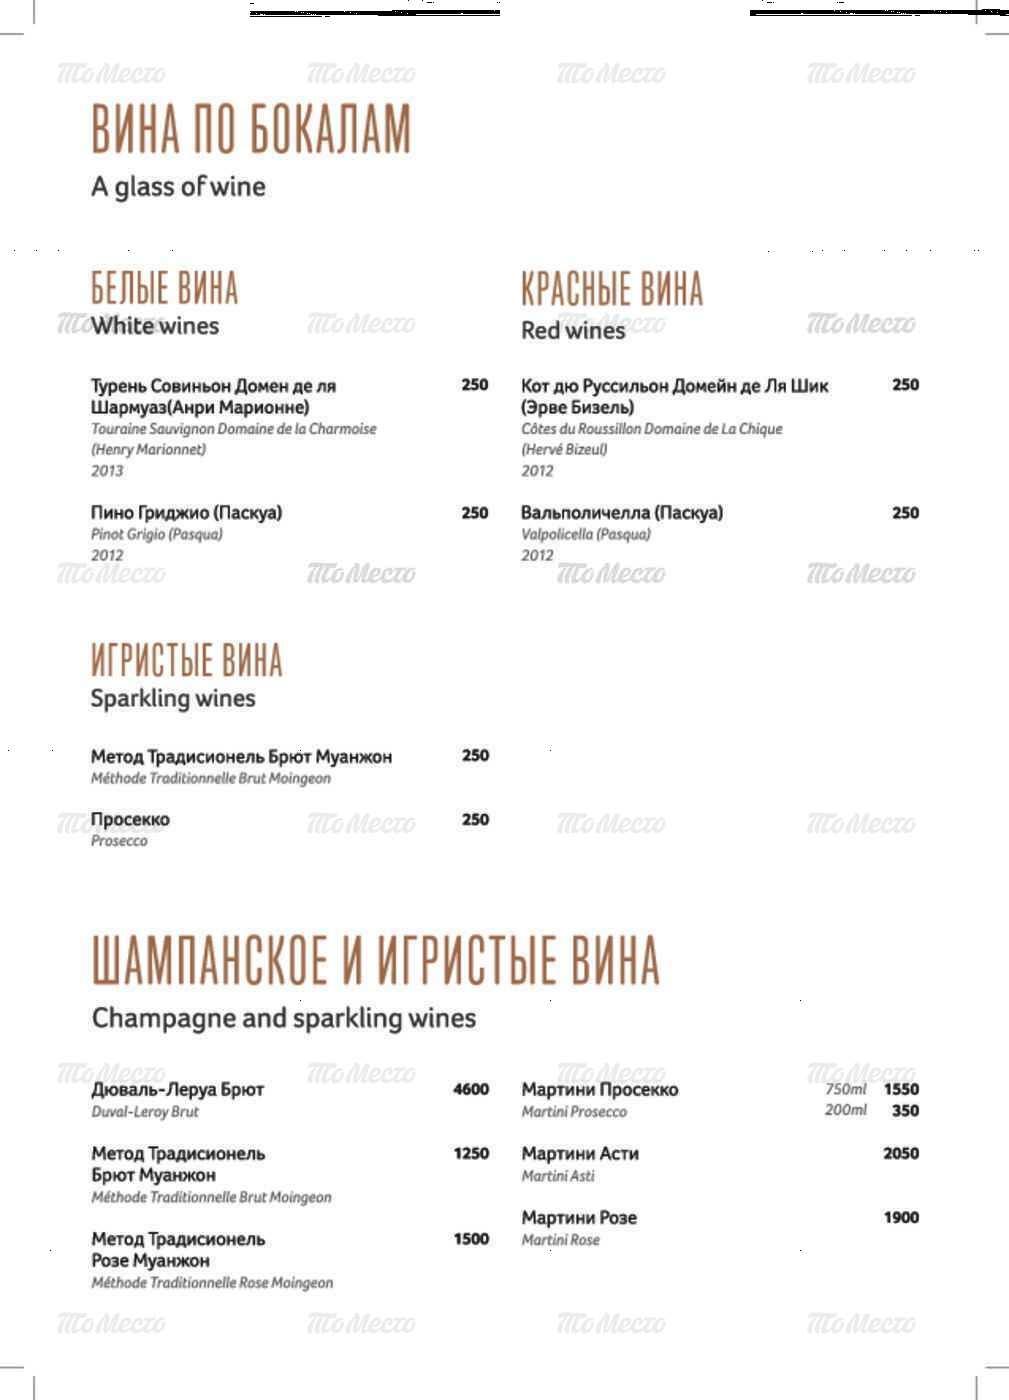 Меню ресторана Brix Tapas&Grill (Винный бар Brix) на улице Покровка